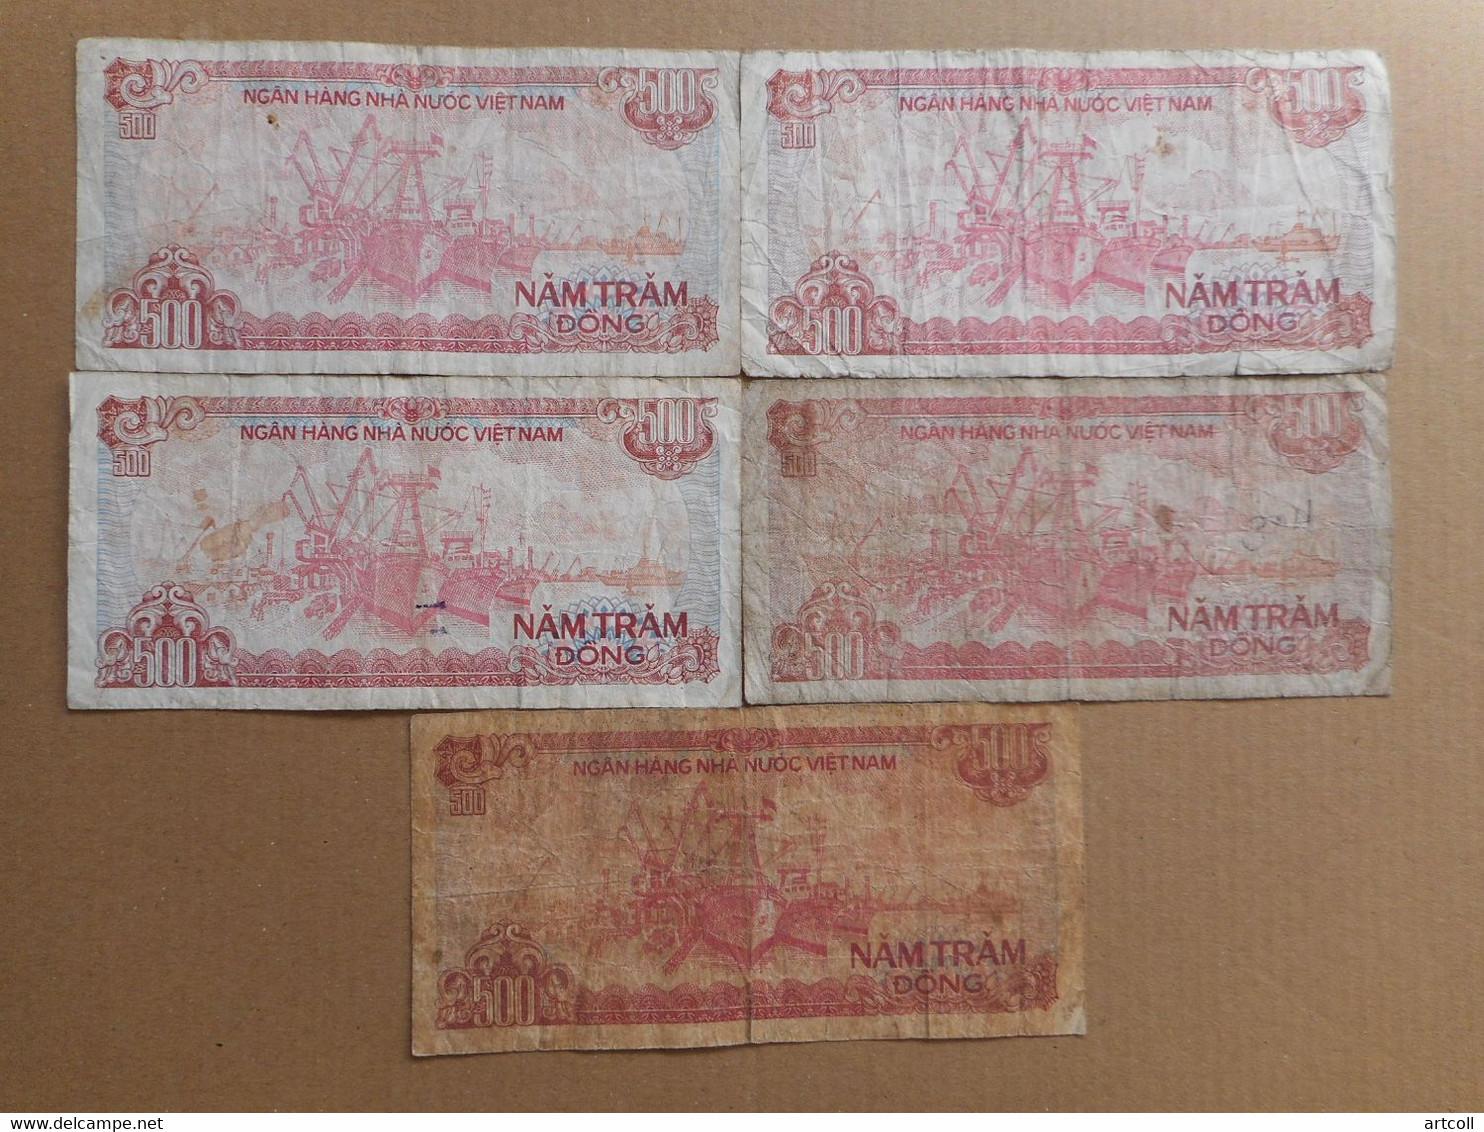 Vietnam 500 Dong 1988 (Lot Of 6 Banknotes) - Vietnam